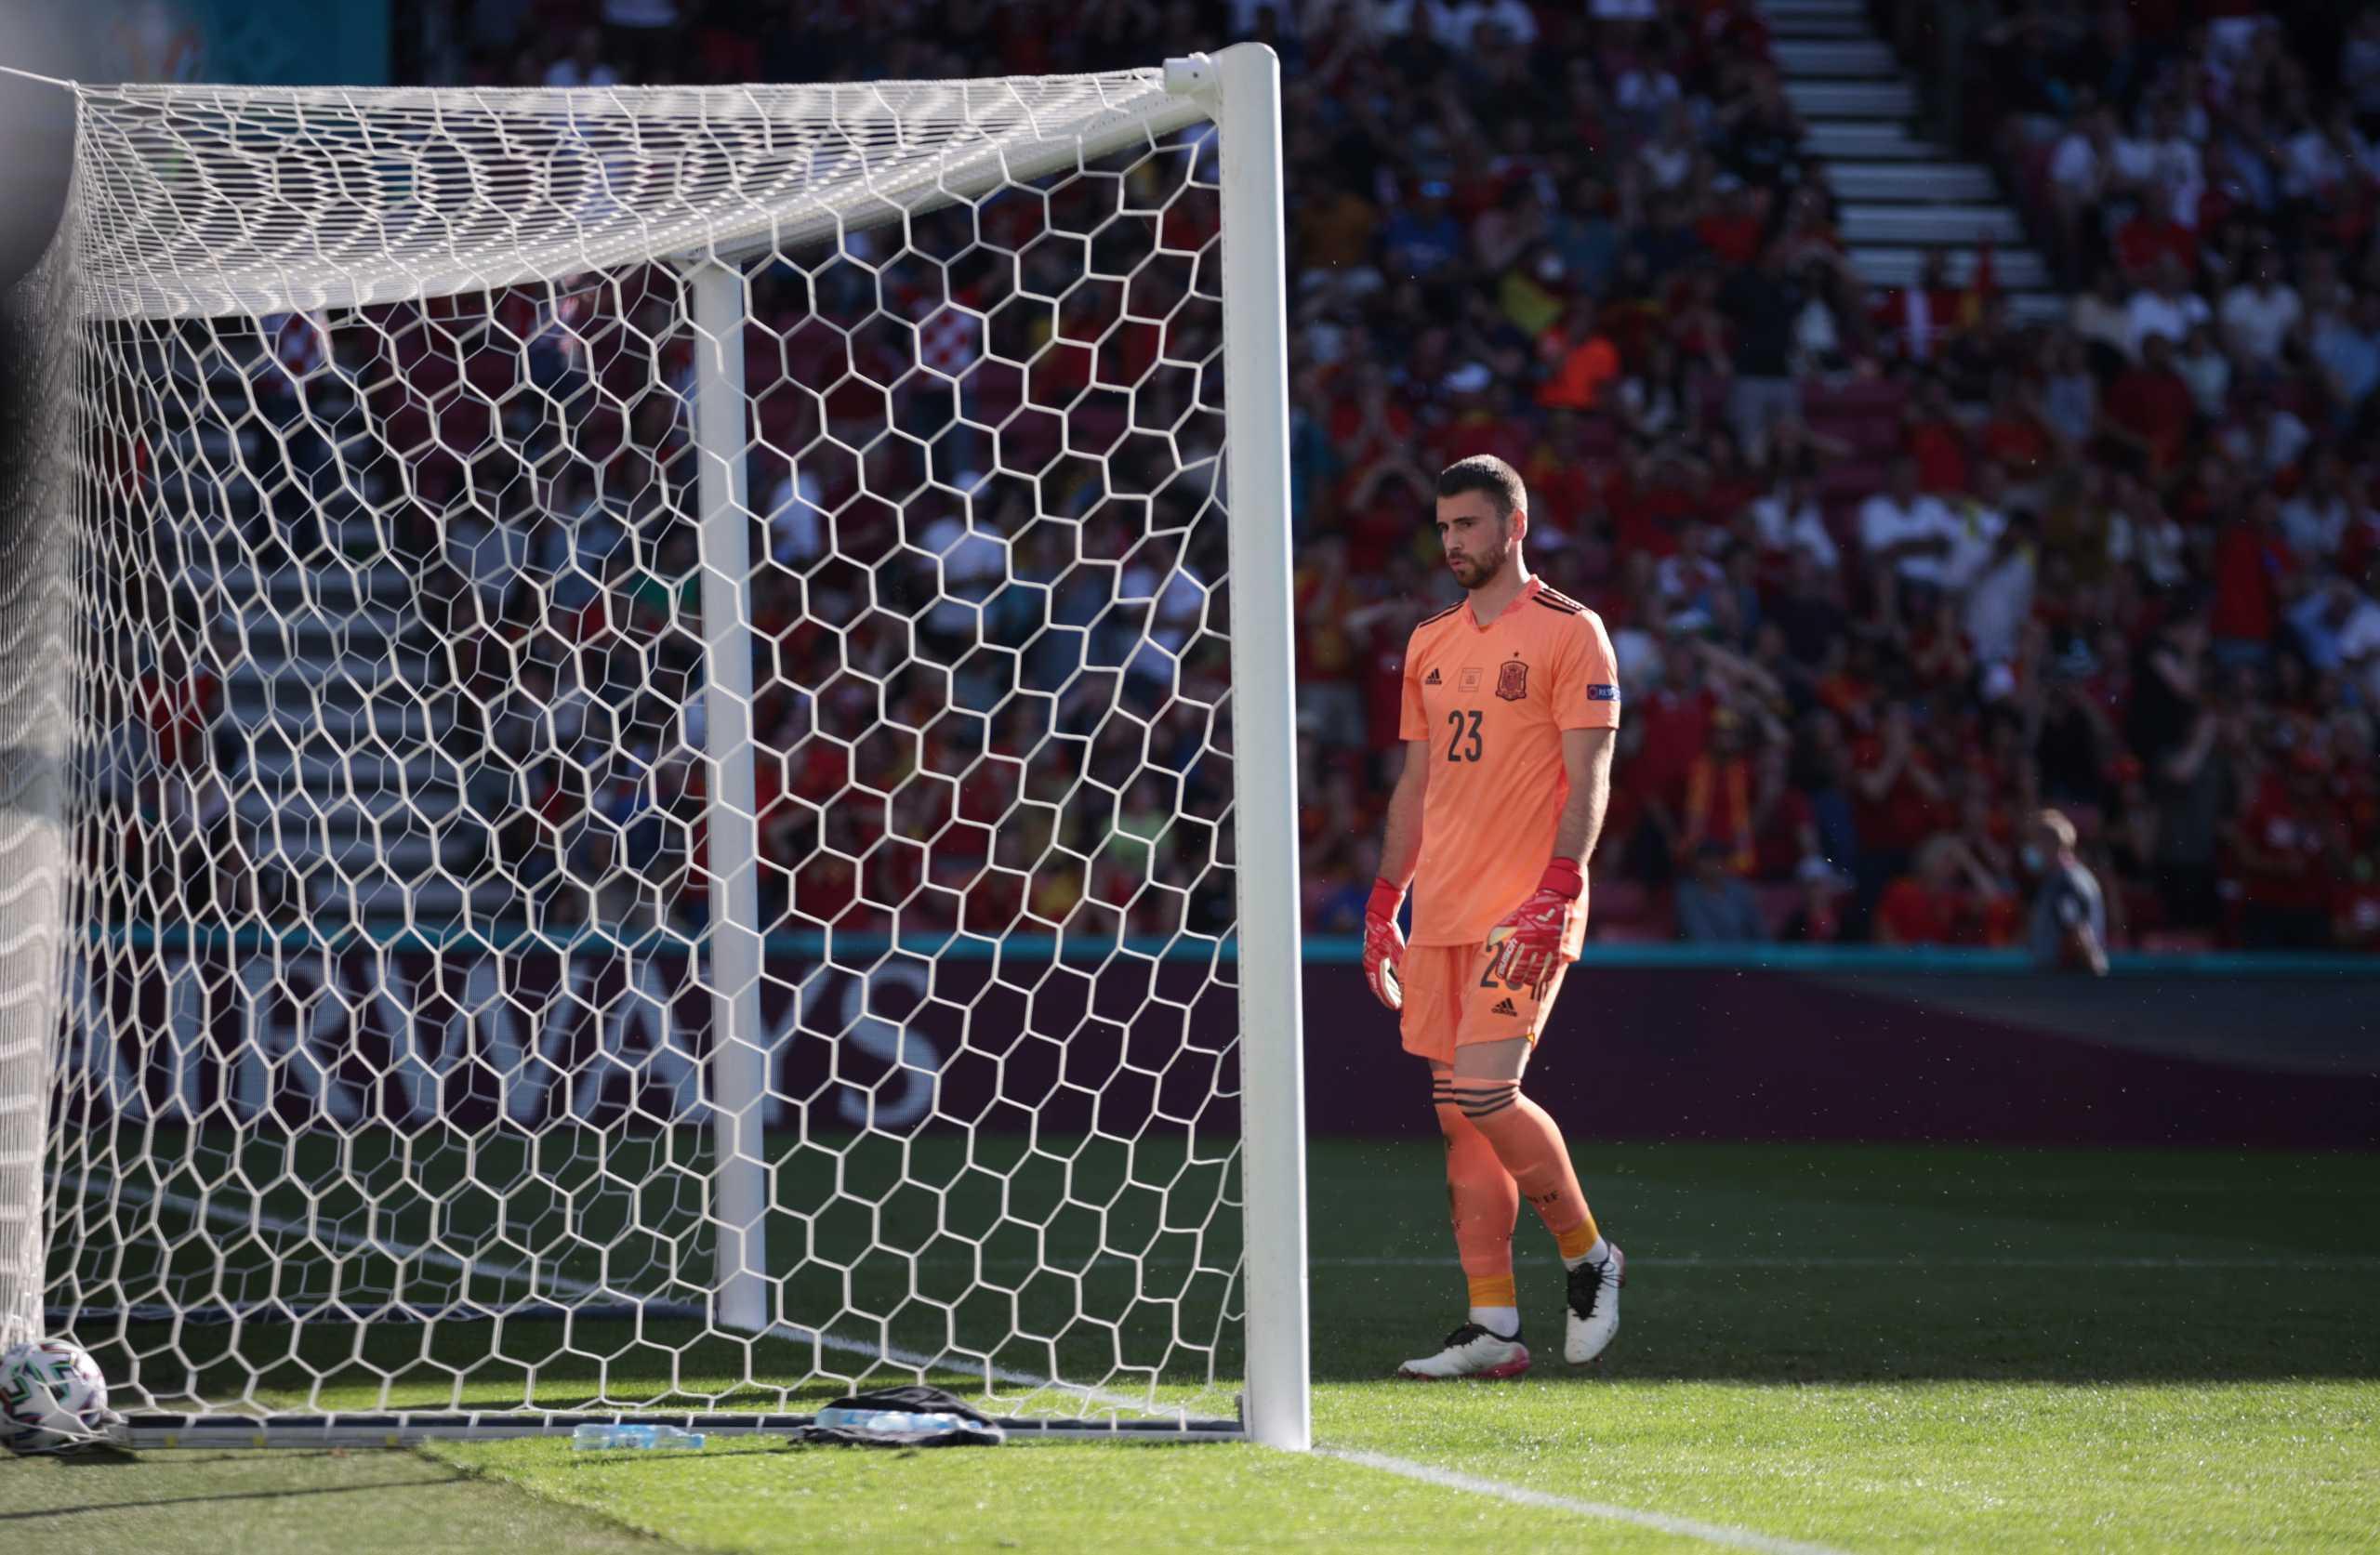 Euro 2020, Κροατία – Ισπανία: Αδιανόητο αυτογκόλ, «κοιμήθηκε» ο τερματοφύλακας